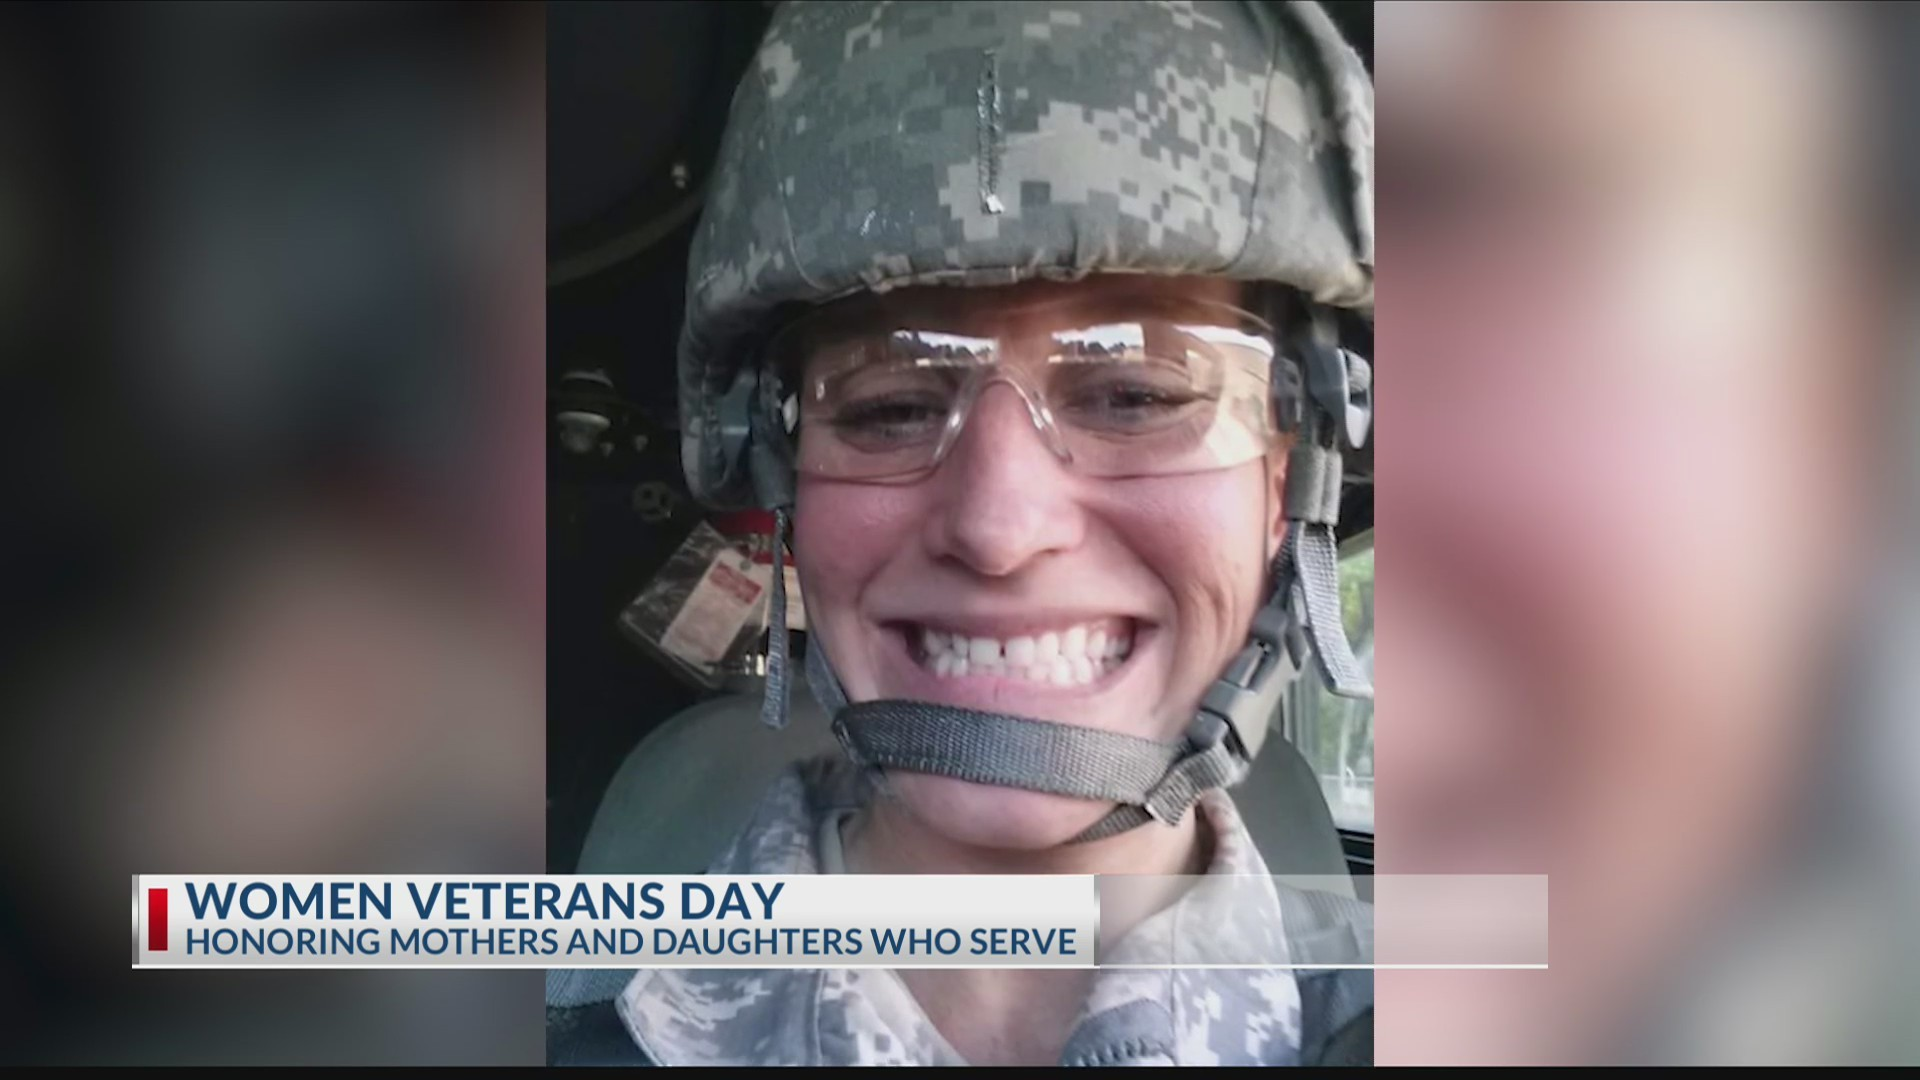 Tyler_pays_tribute_to_women_veterans_0_20190613030640